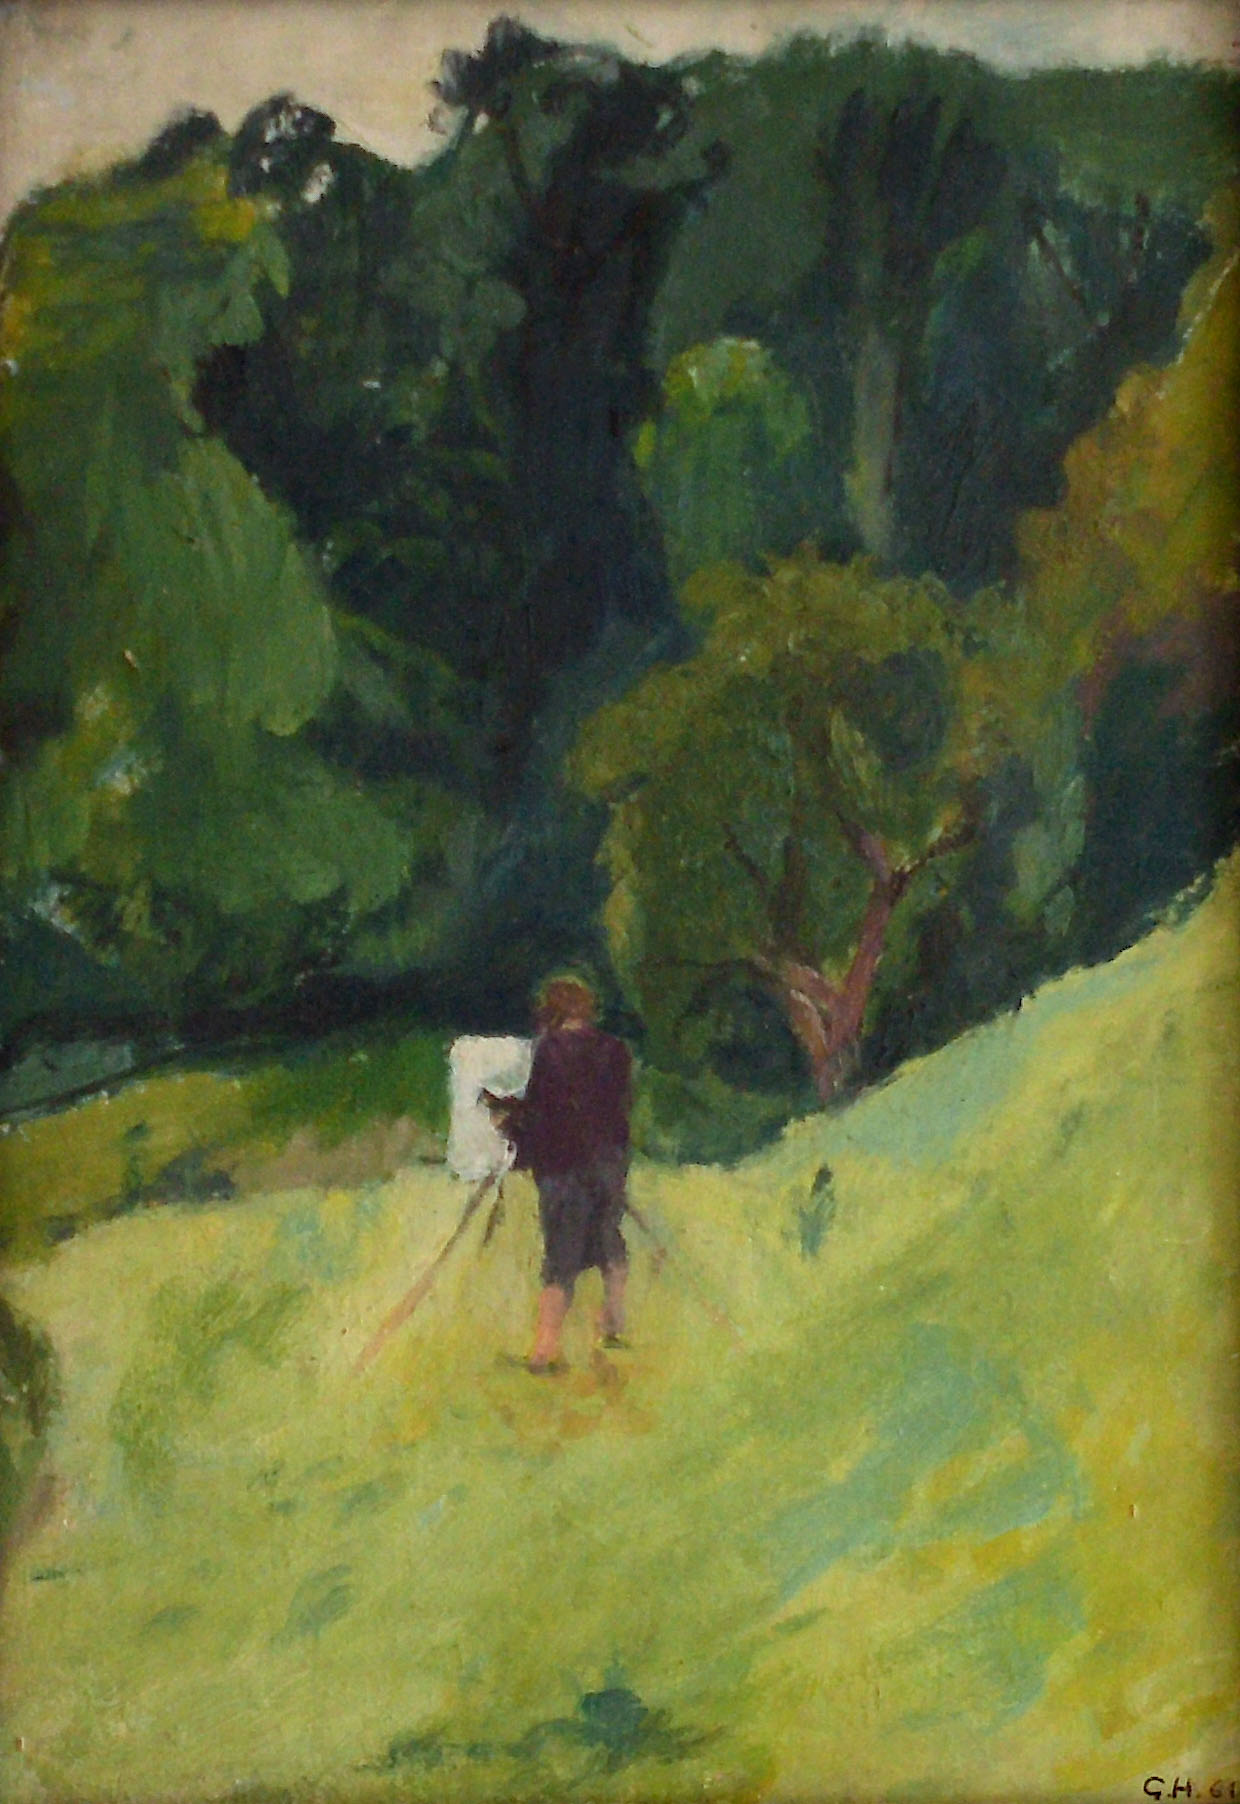 Gunter Herrmann - Maler P.K. im Rehbockgrund